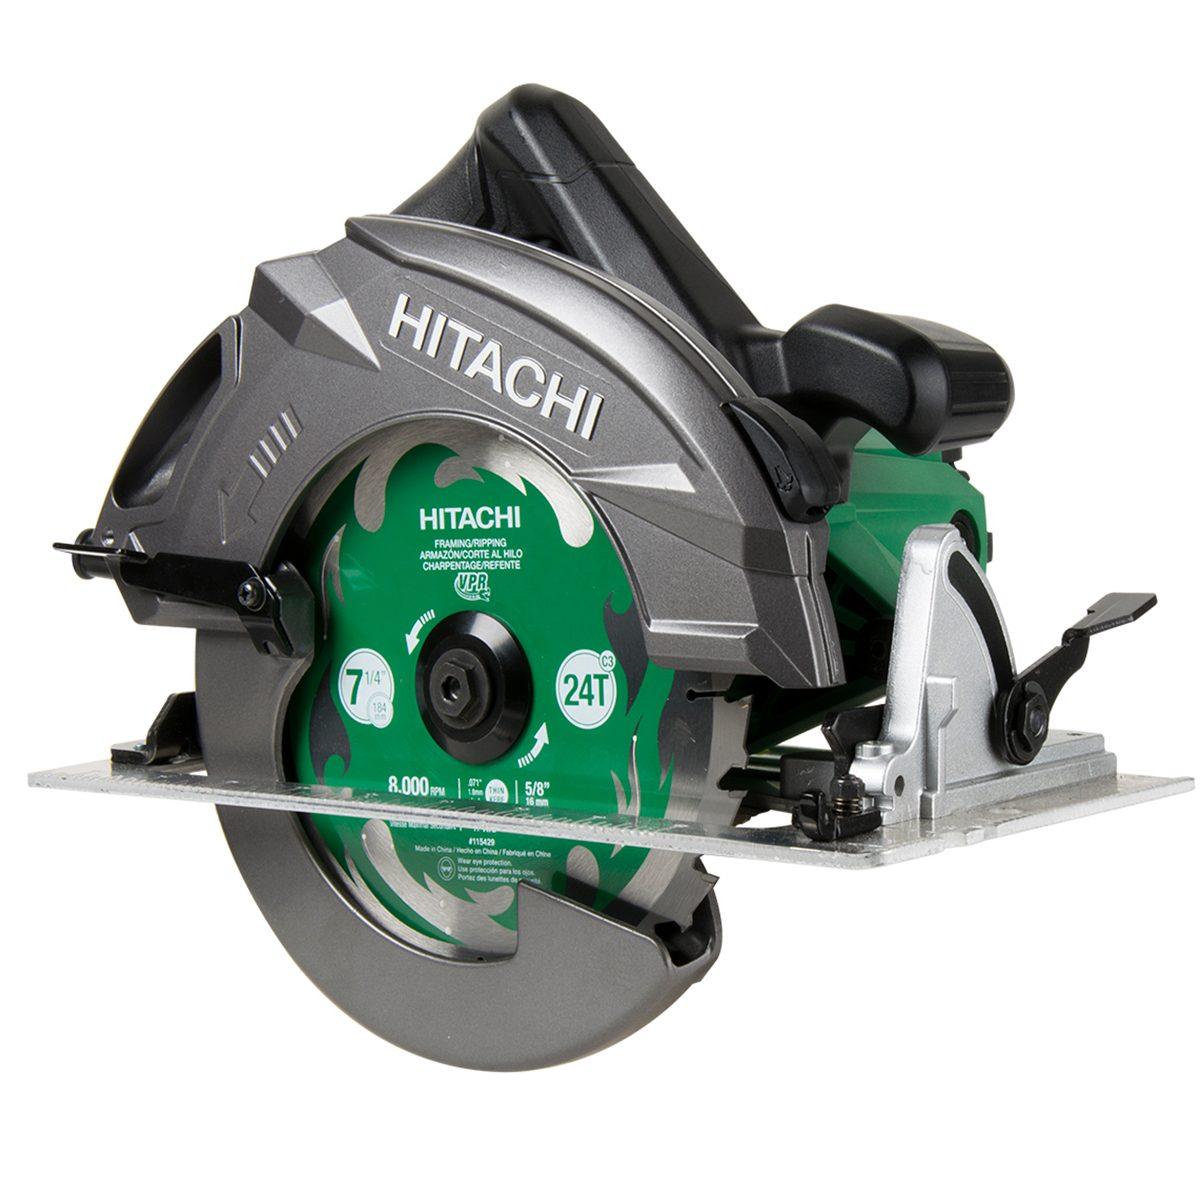 Green and Grey Hitachi Circular Saw | Construction Pro Tips